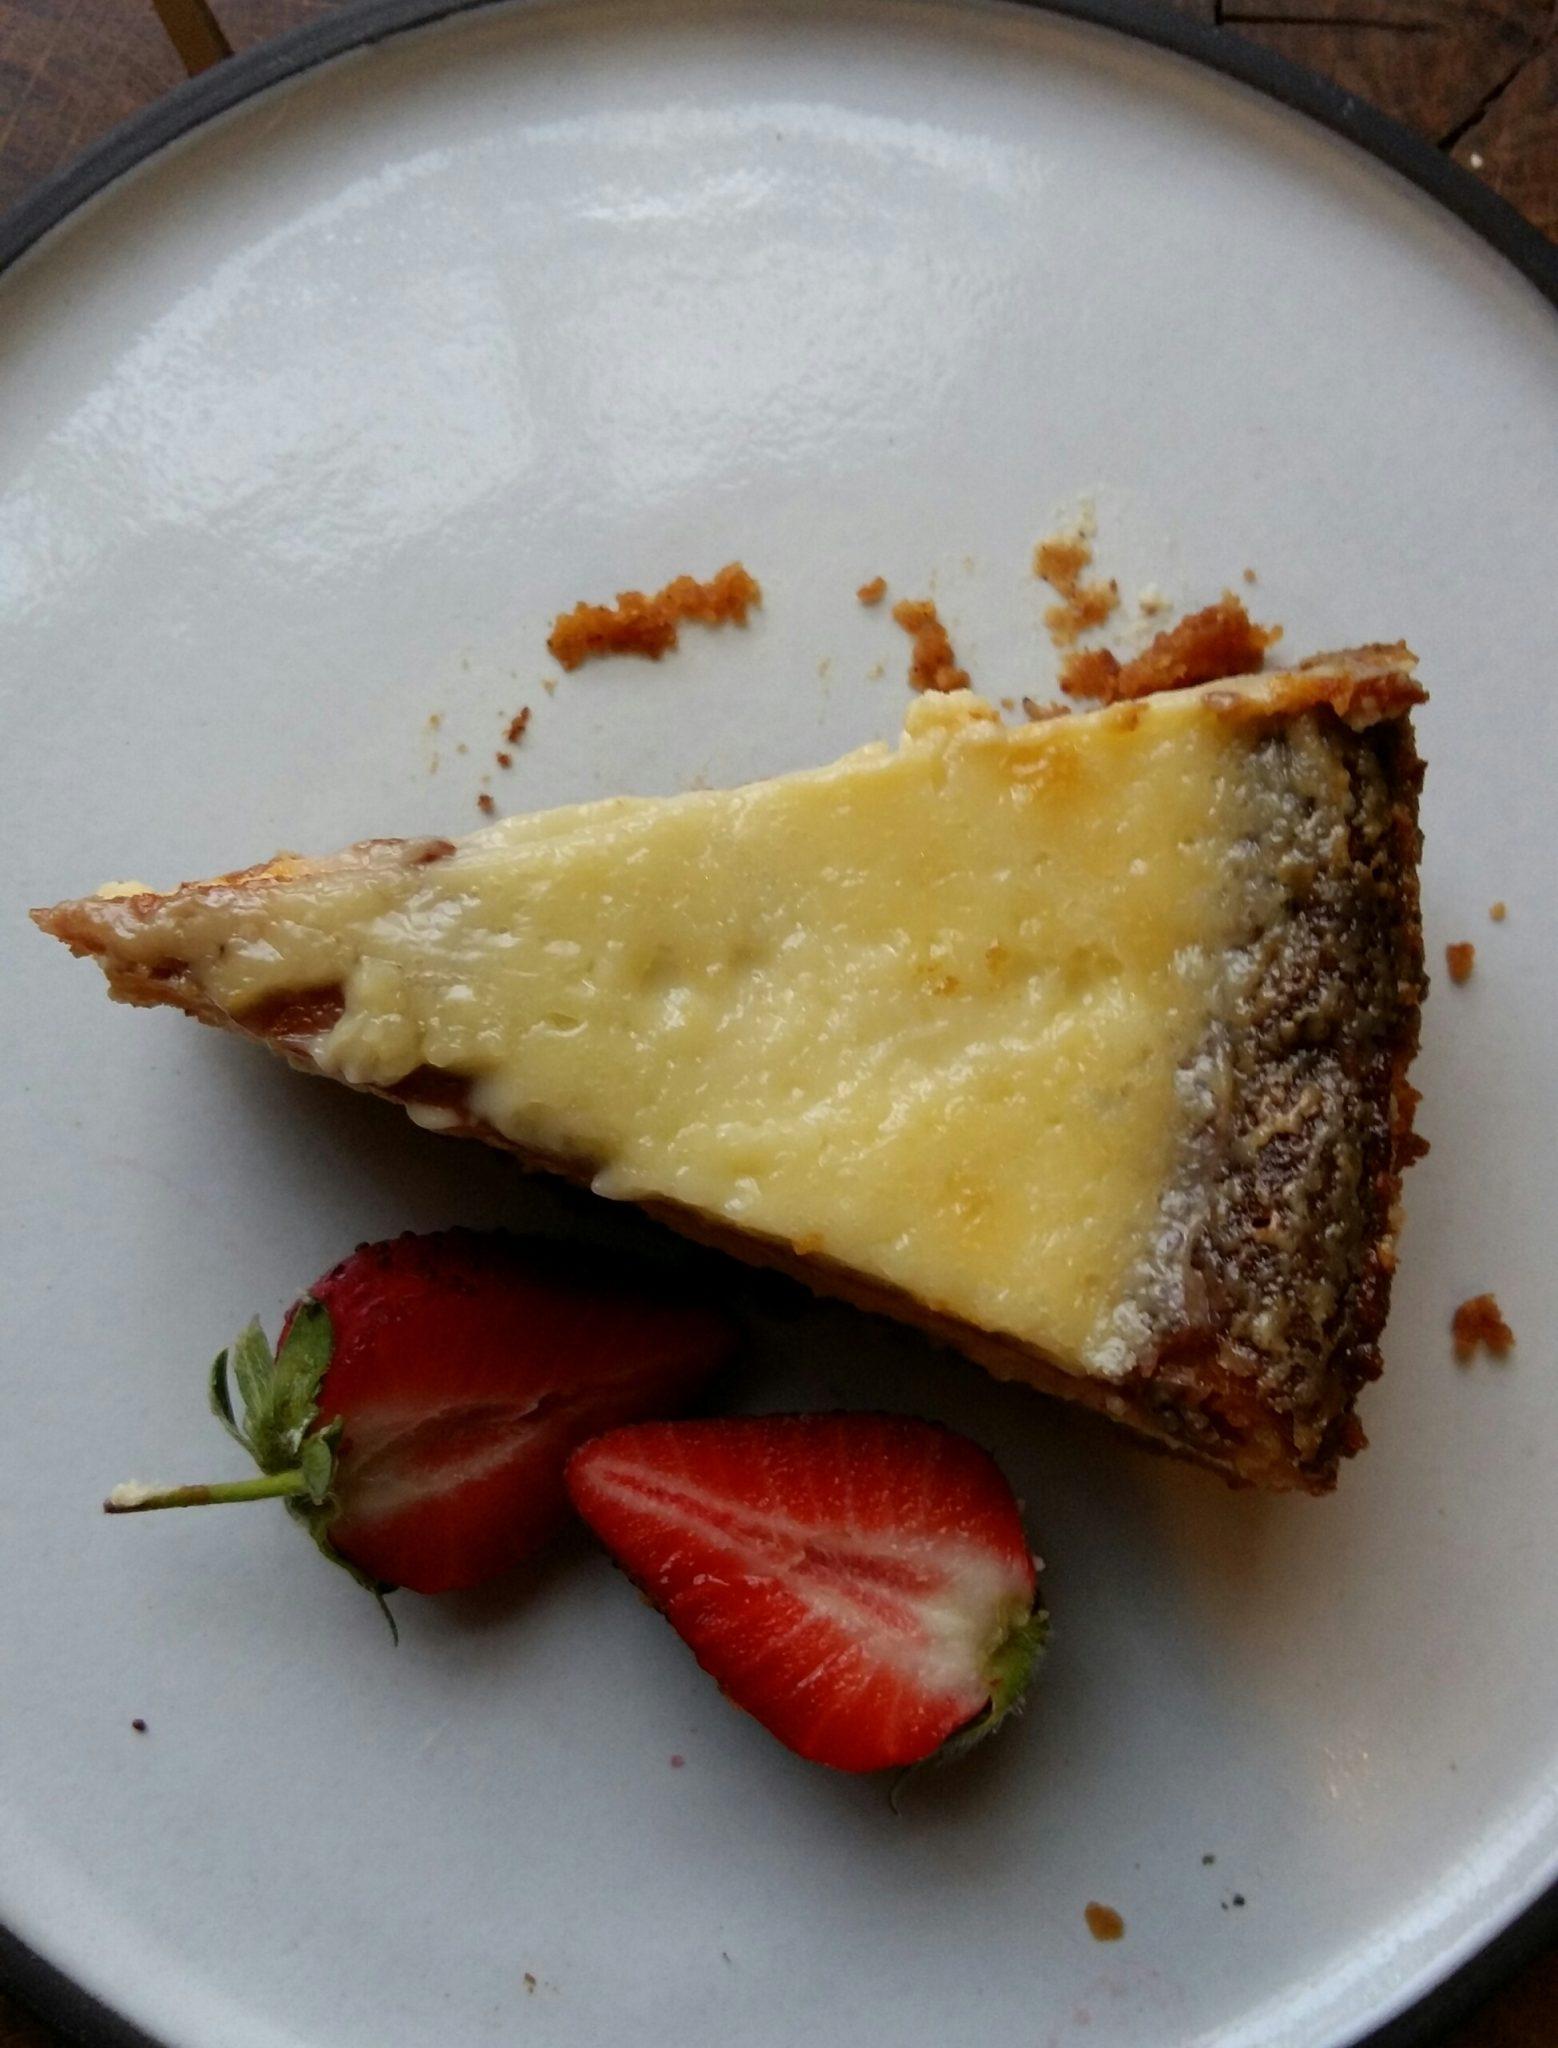 New York sour cream cheesecake with orange and lemon zest